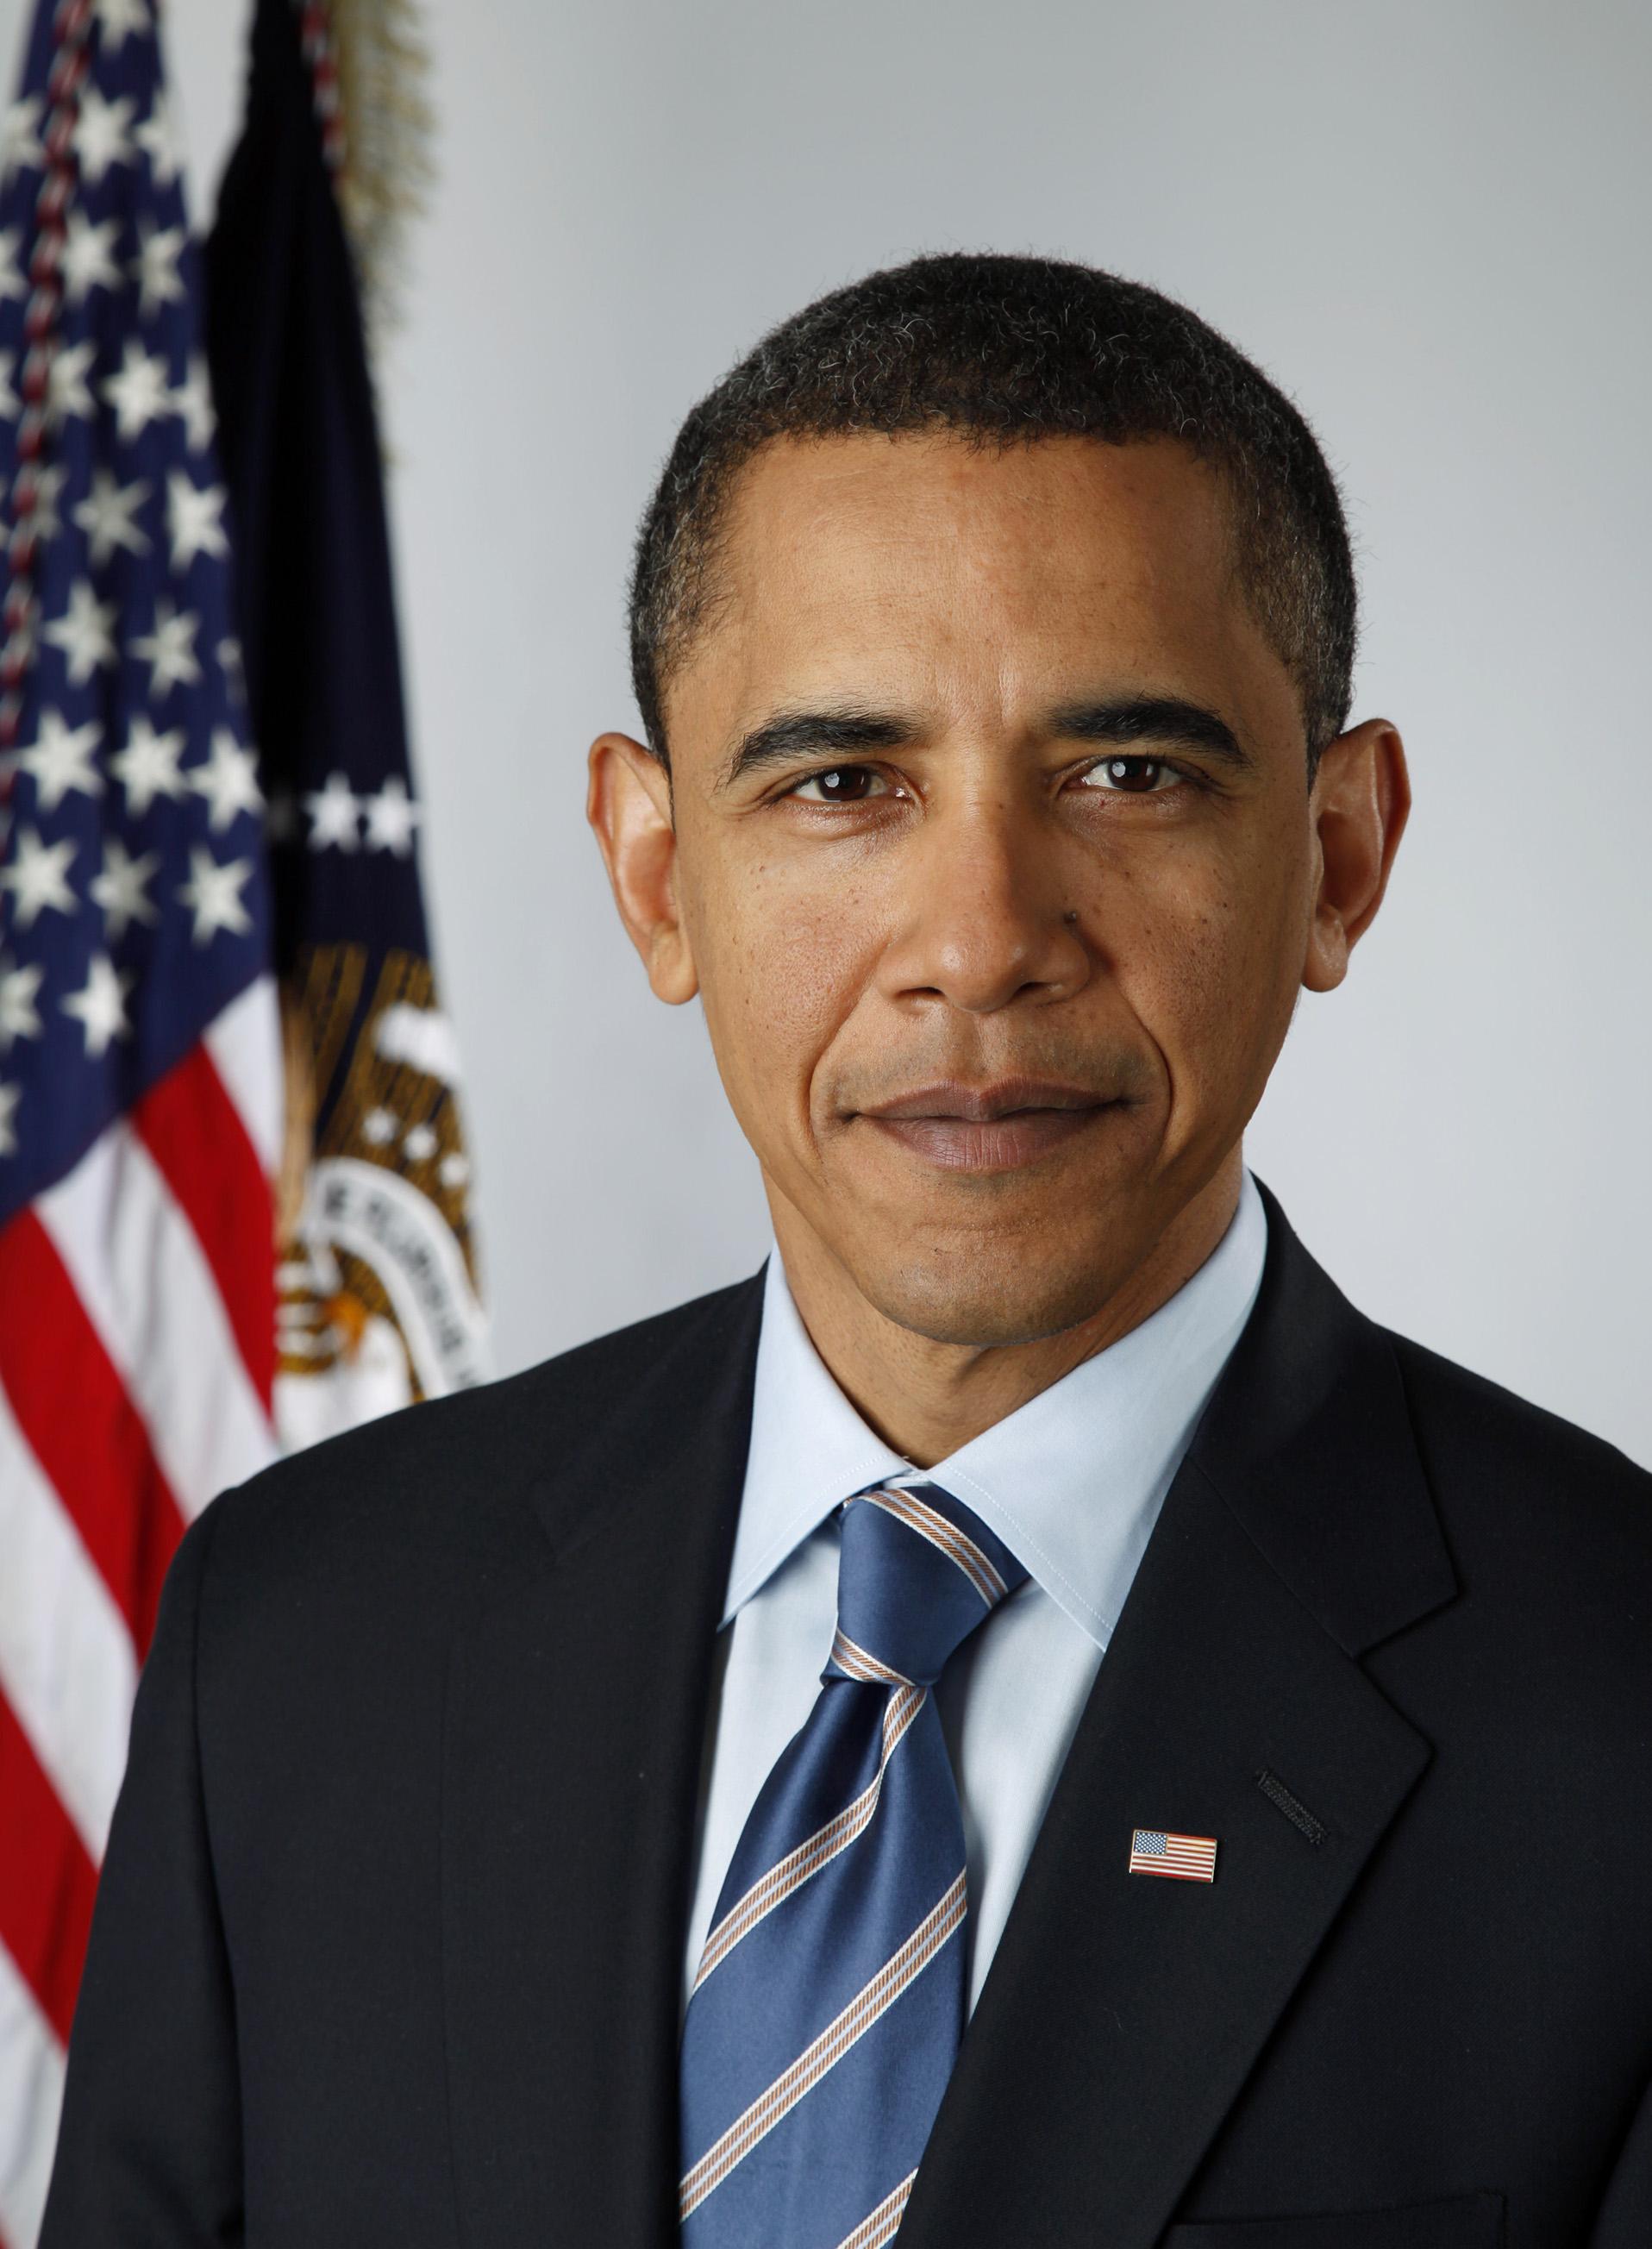 barack obama wiki